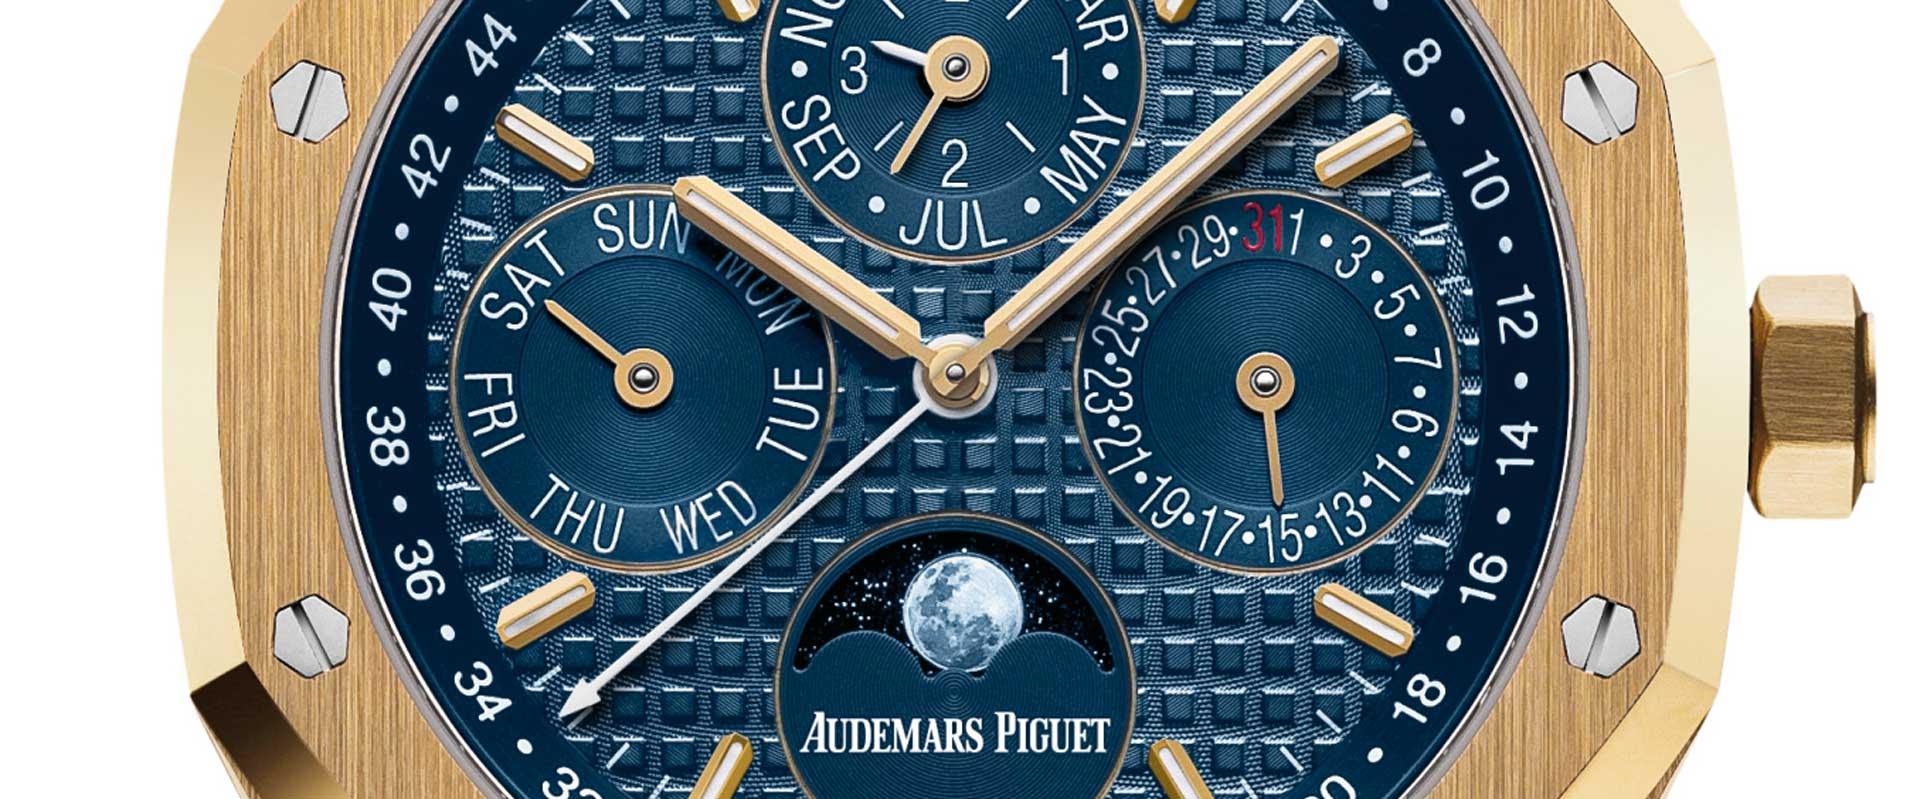 Audemars Piguet Royal Oak Perpetual Calendar In Yellow Gold